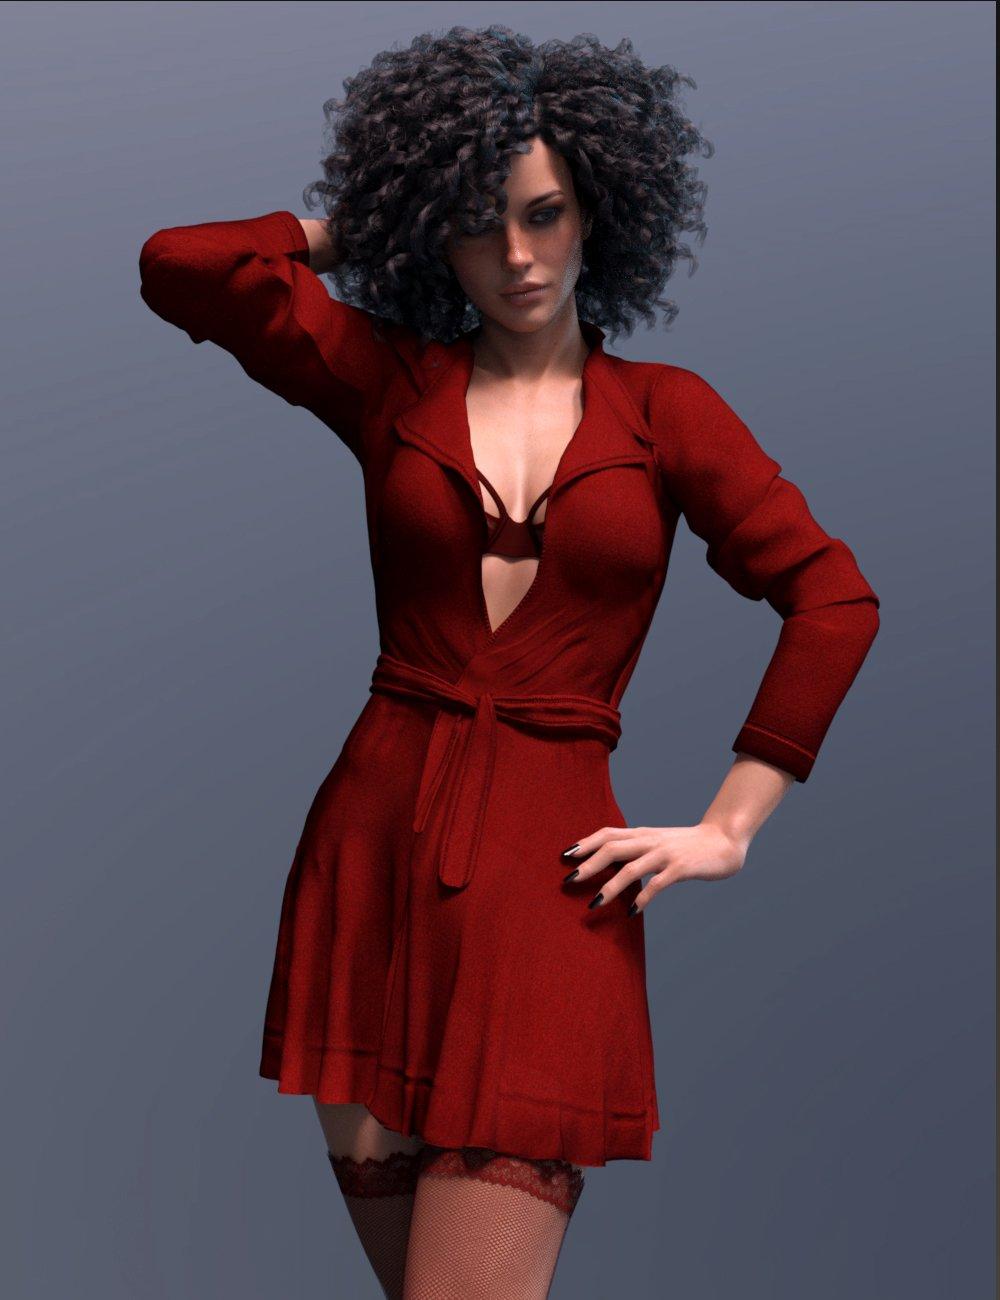 https://gcdn.daz3d.com/p/72349/i/dforce-x-fashion-temptation-dress-coat-for-genesis-8-females-00-main-daz3d.jpg